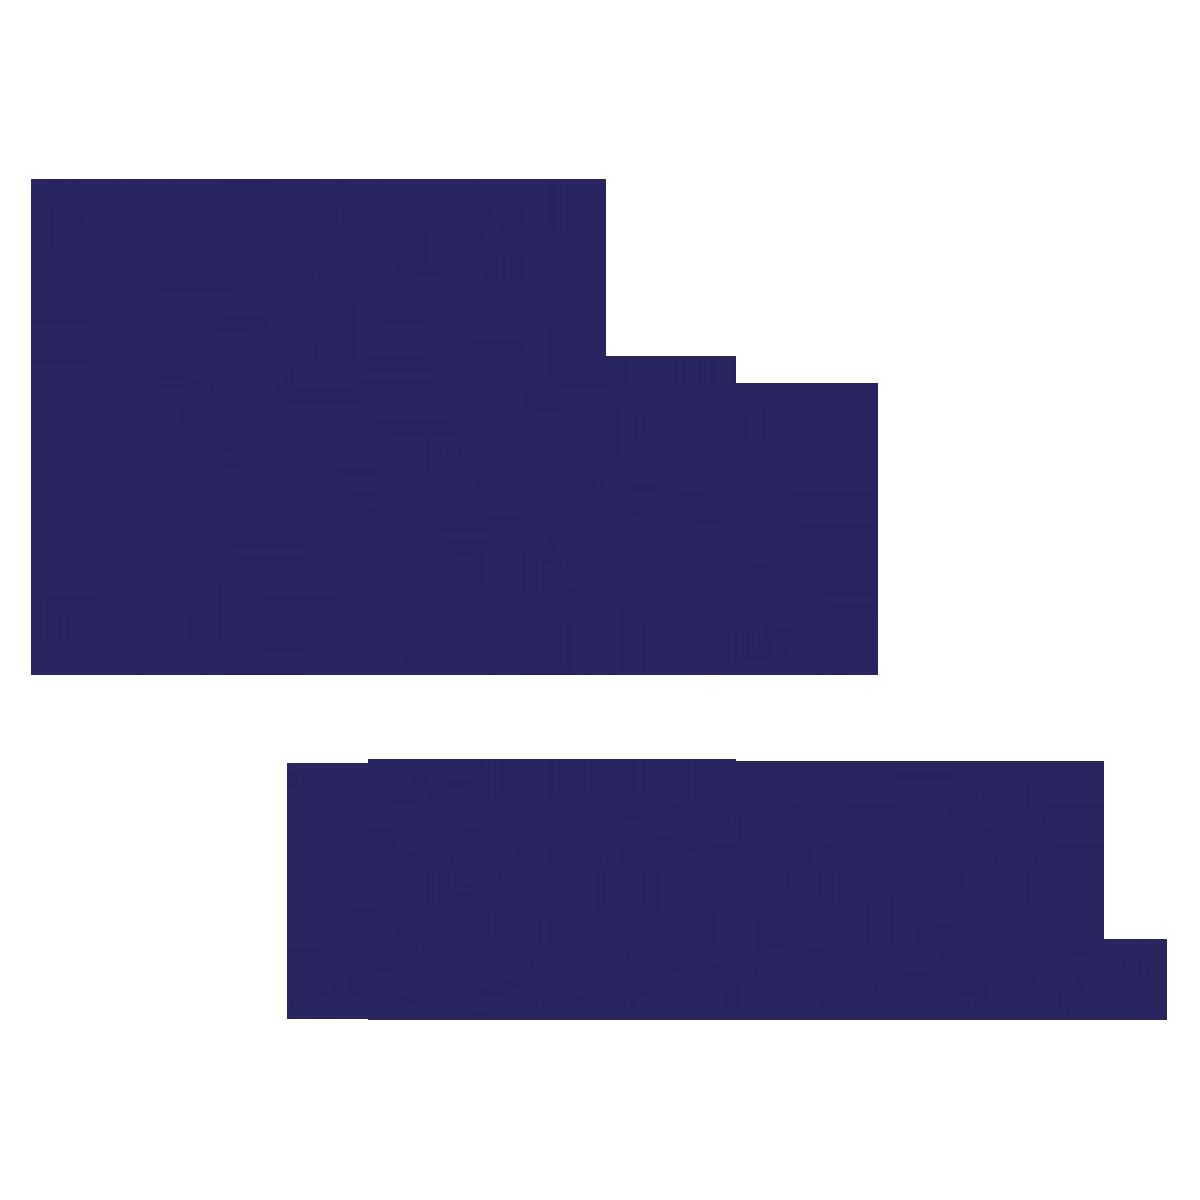 Kiguru & Associates